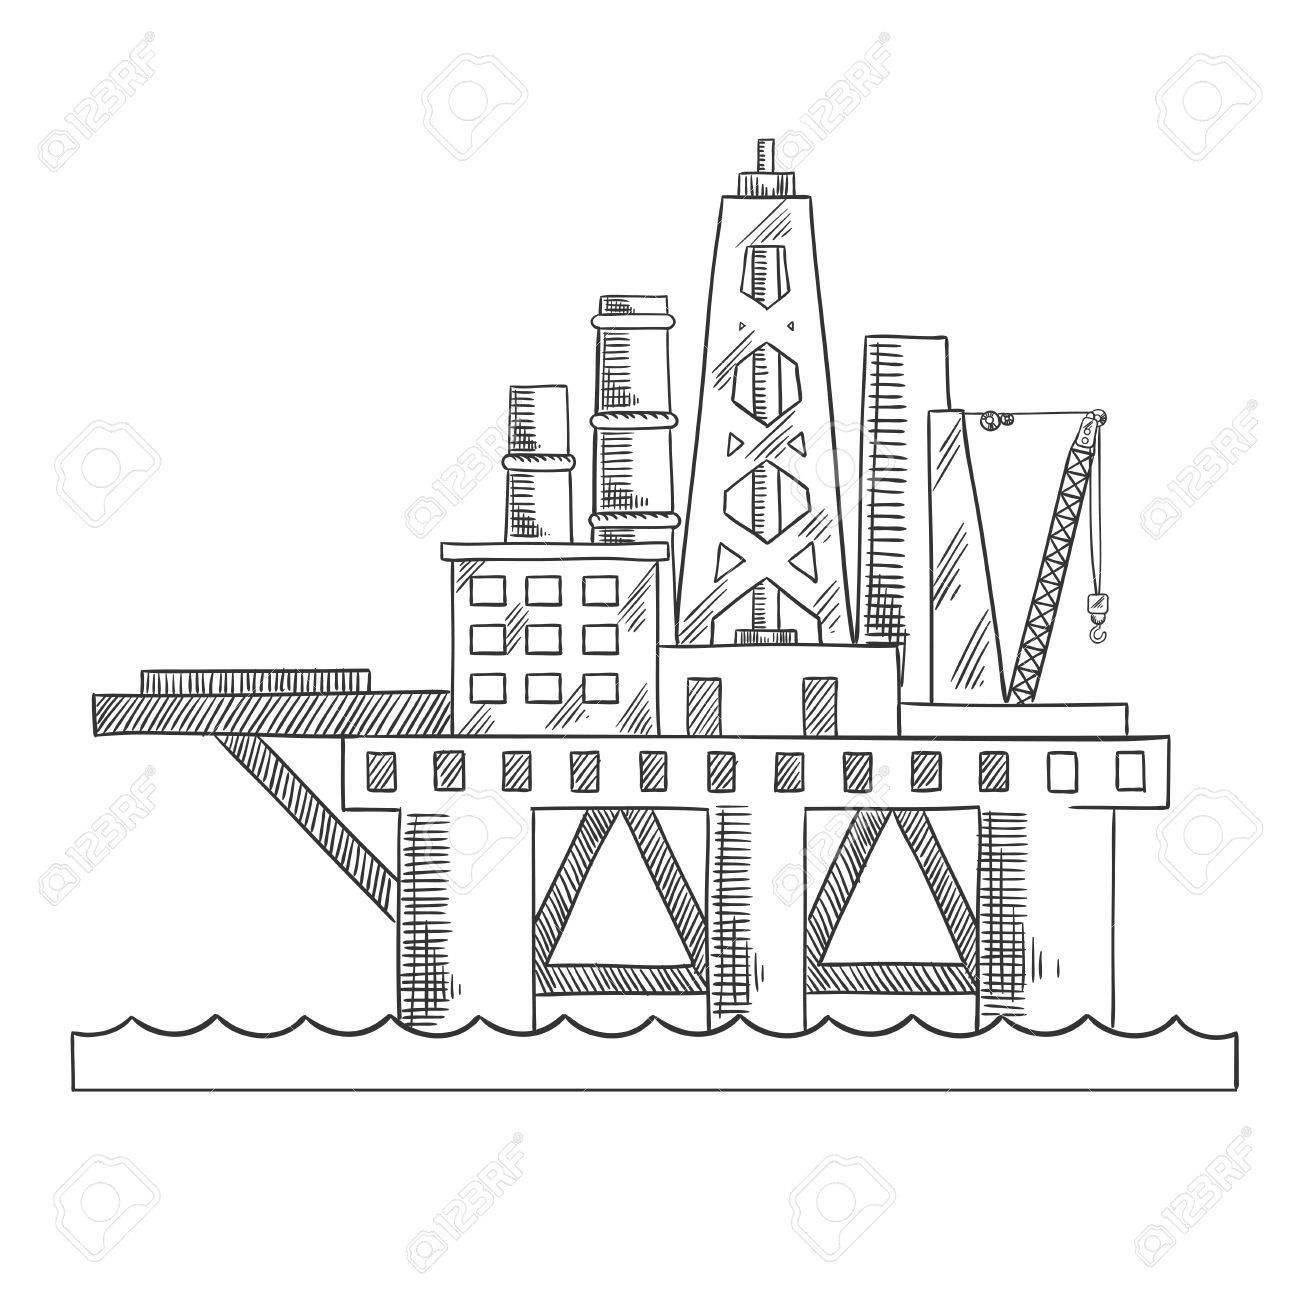 1300x1300 Rising Above The Sea Oil Platform. Platform Drilling Offshore